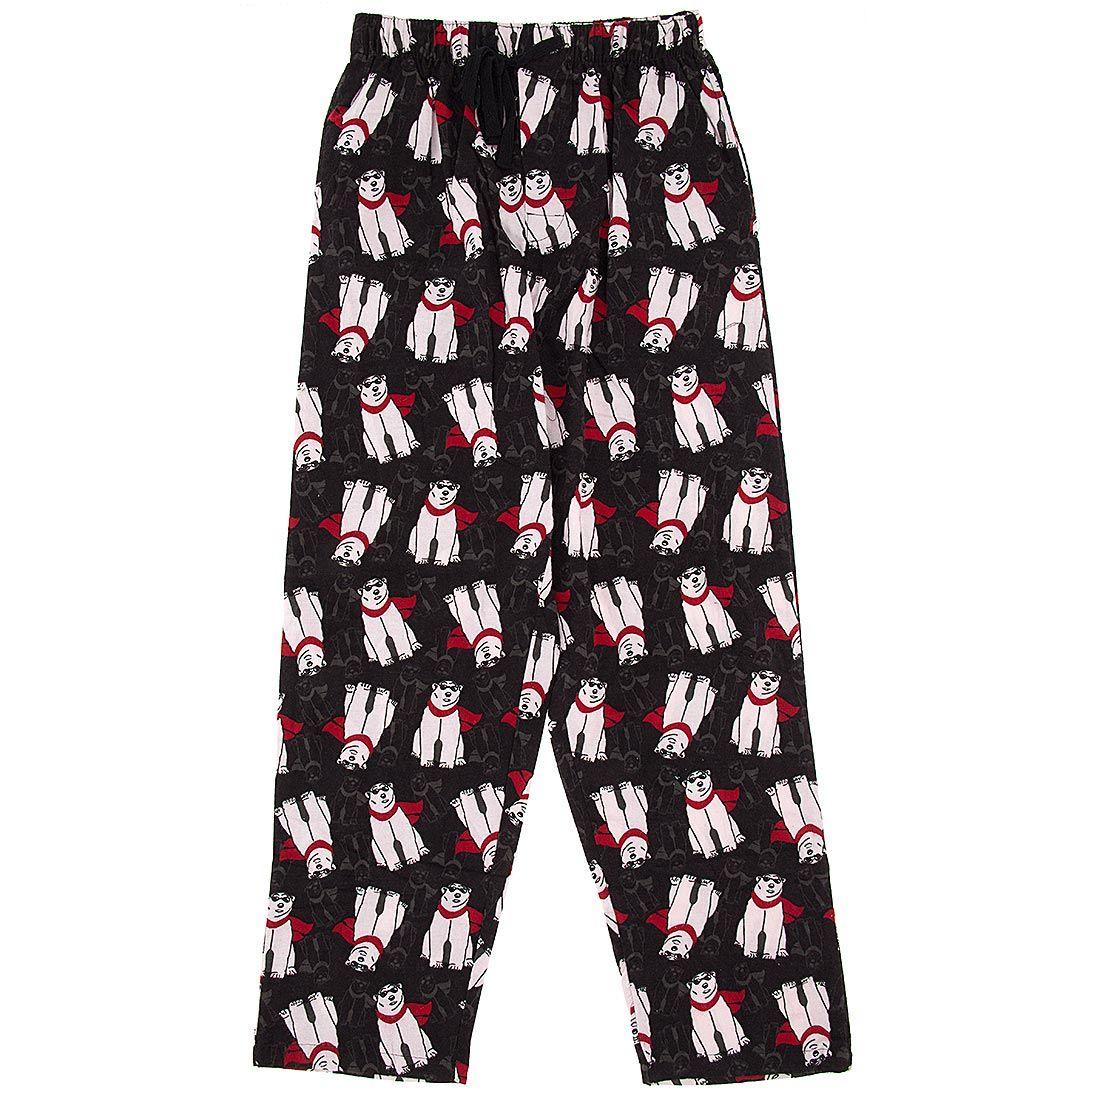 Fleece Pajama Pants For Men  Pajama Pants, Fleece Pajamas -8962